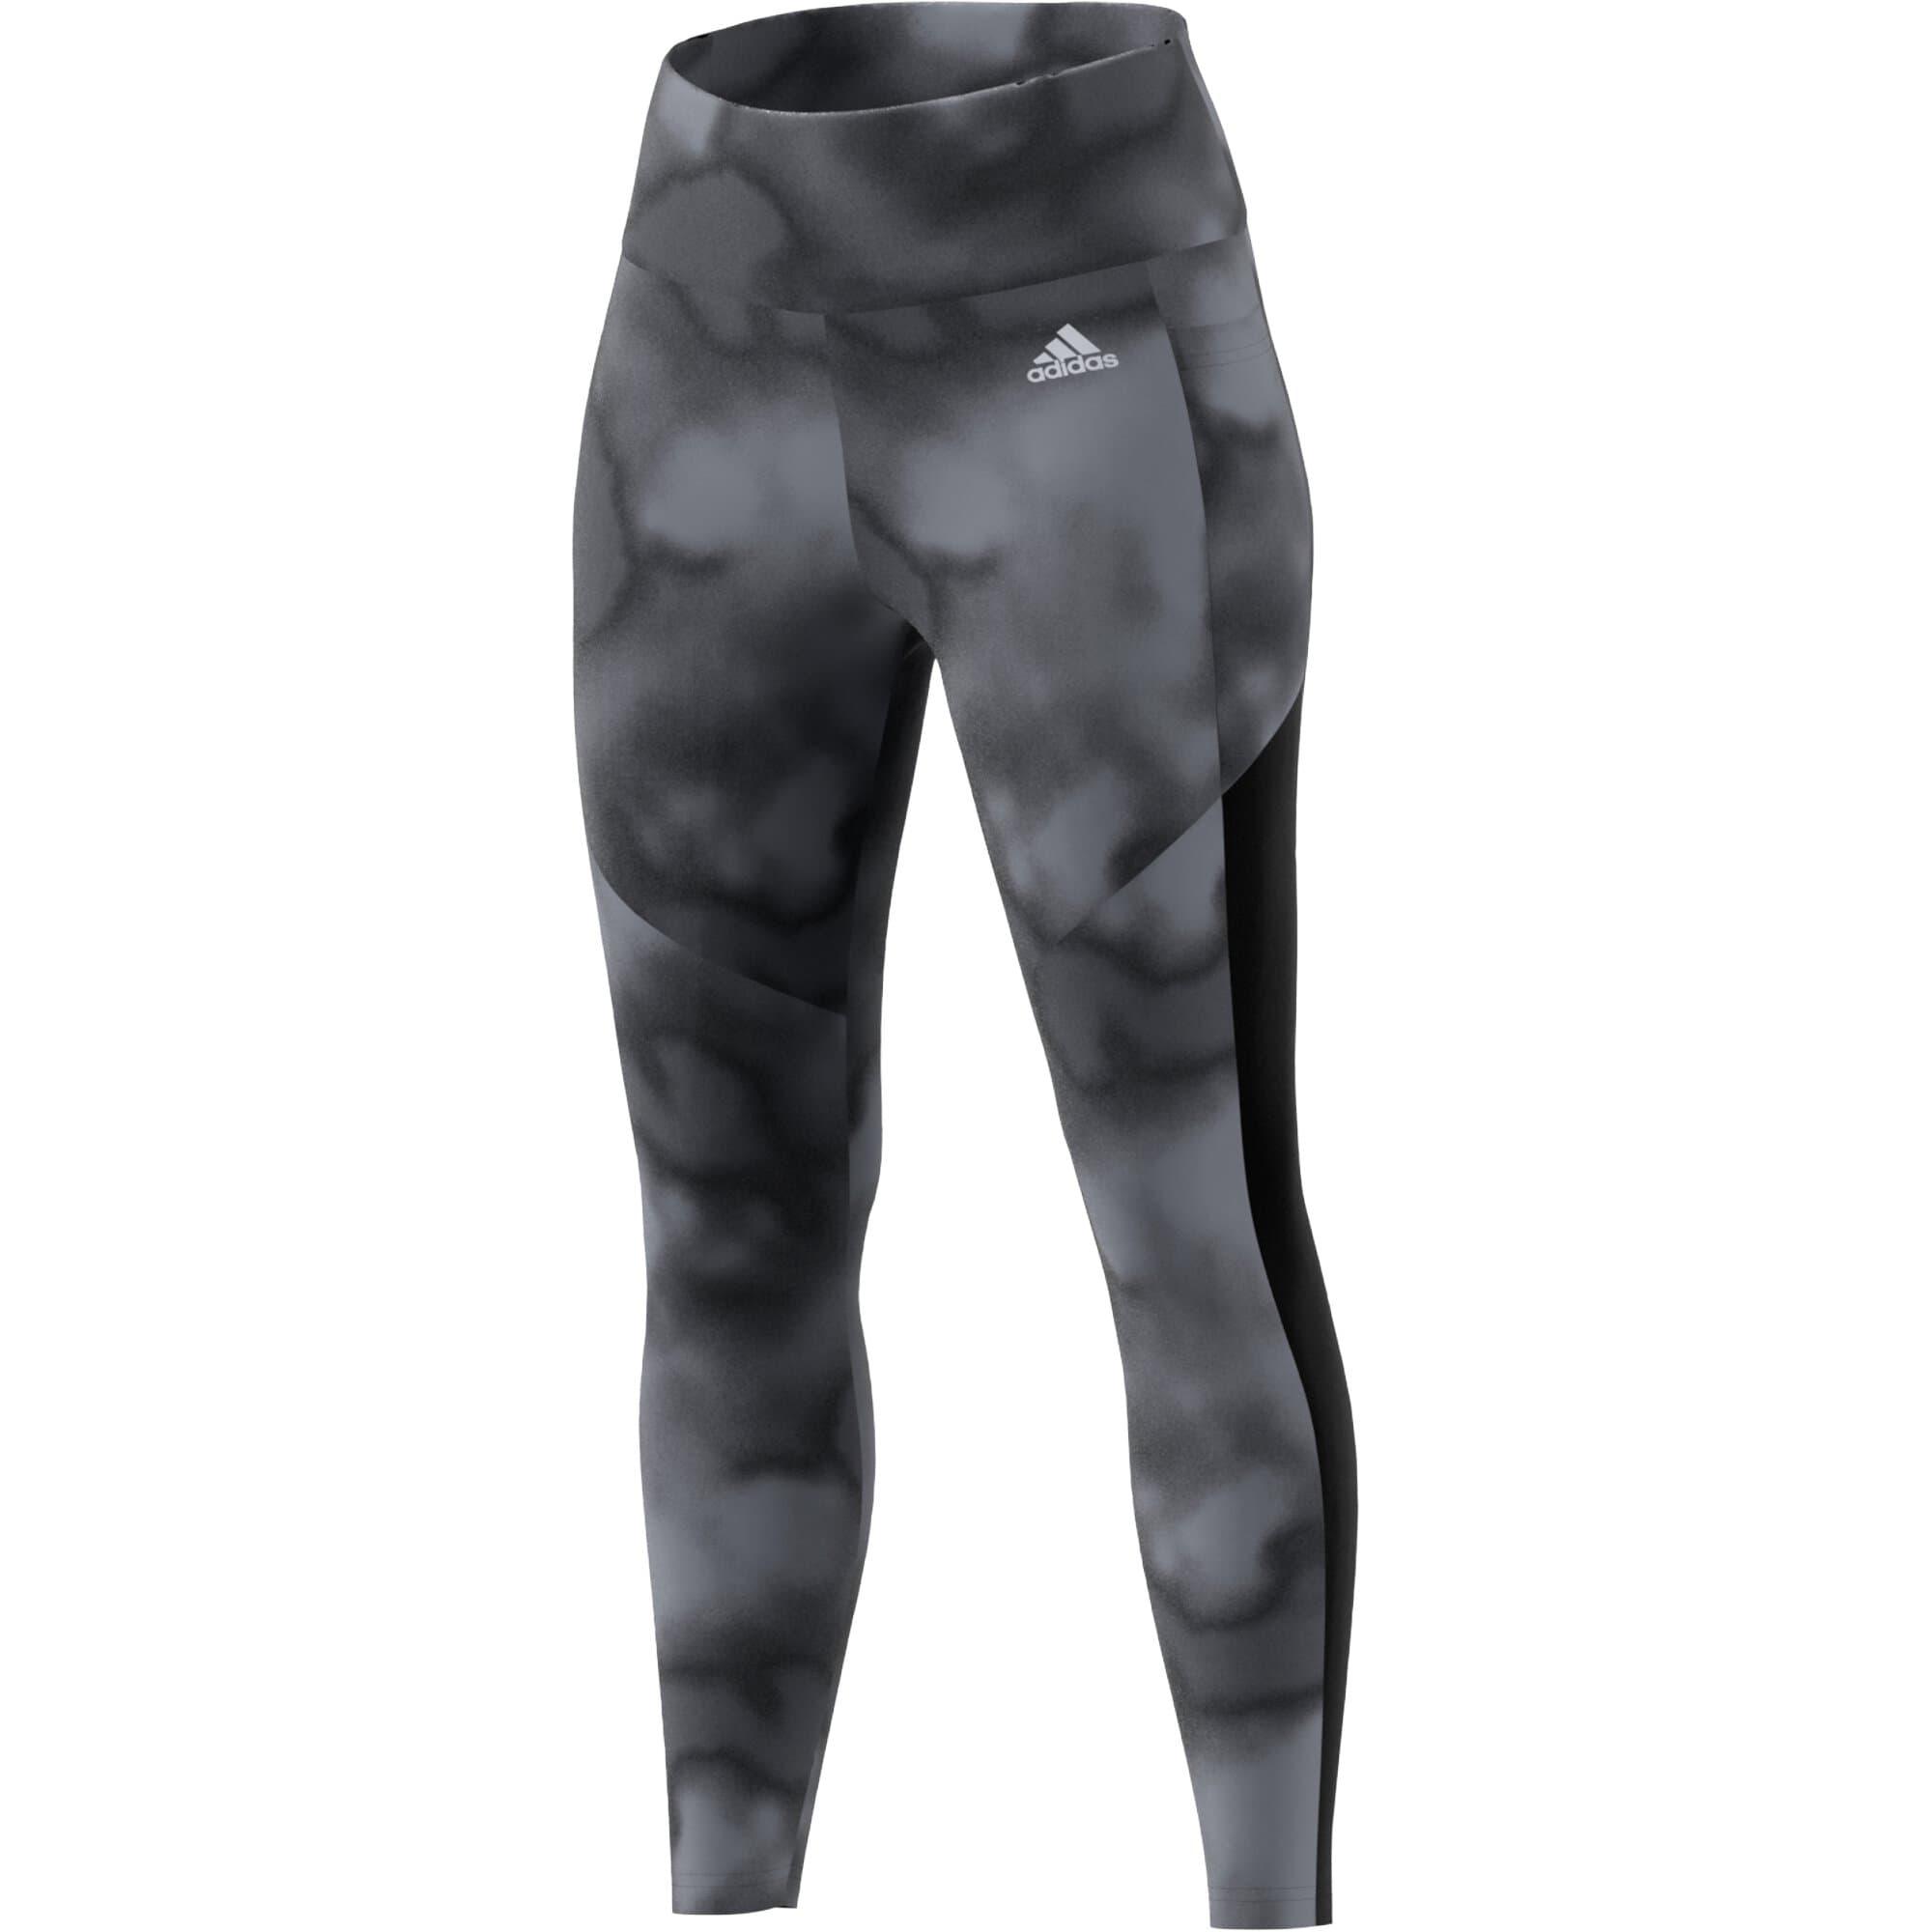 Adidas DESIGNED TO MOVE AOP 7/8 TIGHT Leggings 7/8 pour femme